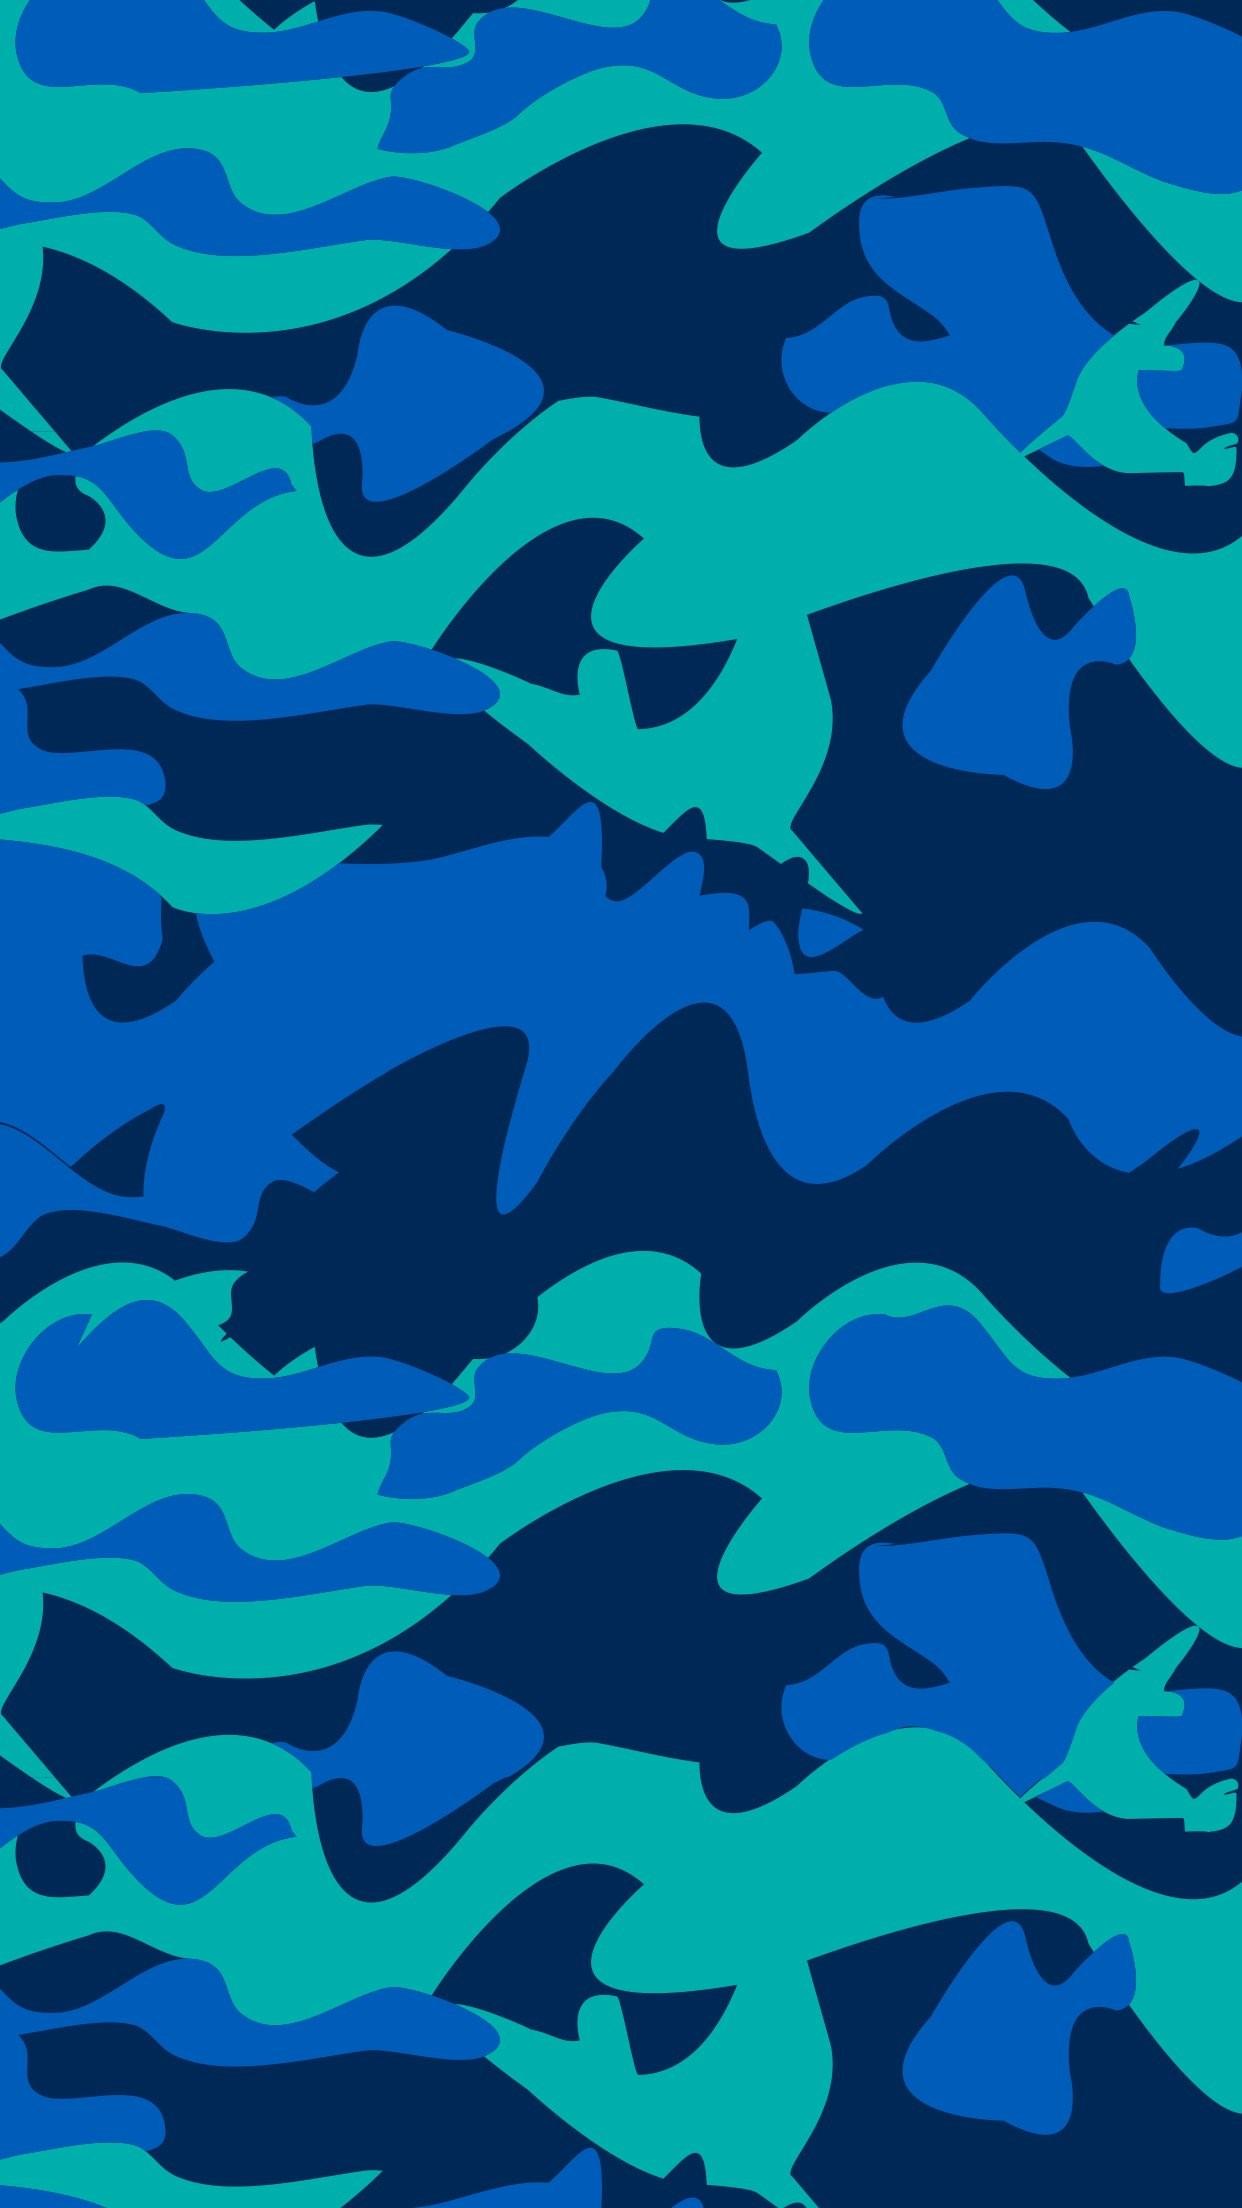 Bape shark wallpaper 49 images - Camo shark wallpaper ...